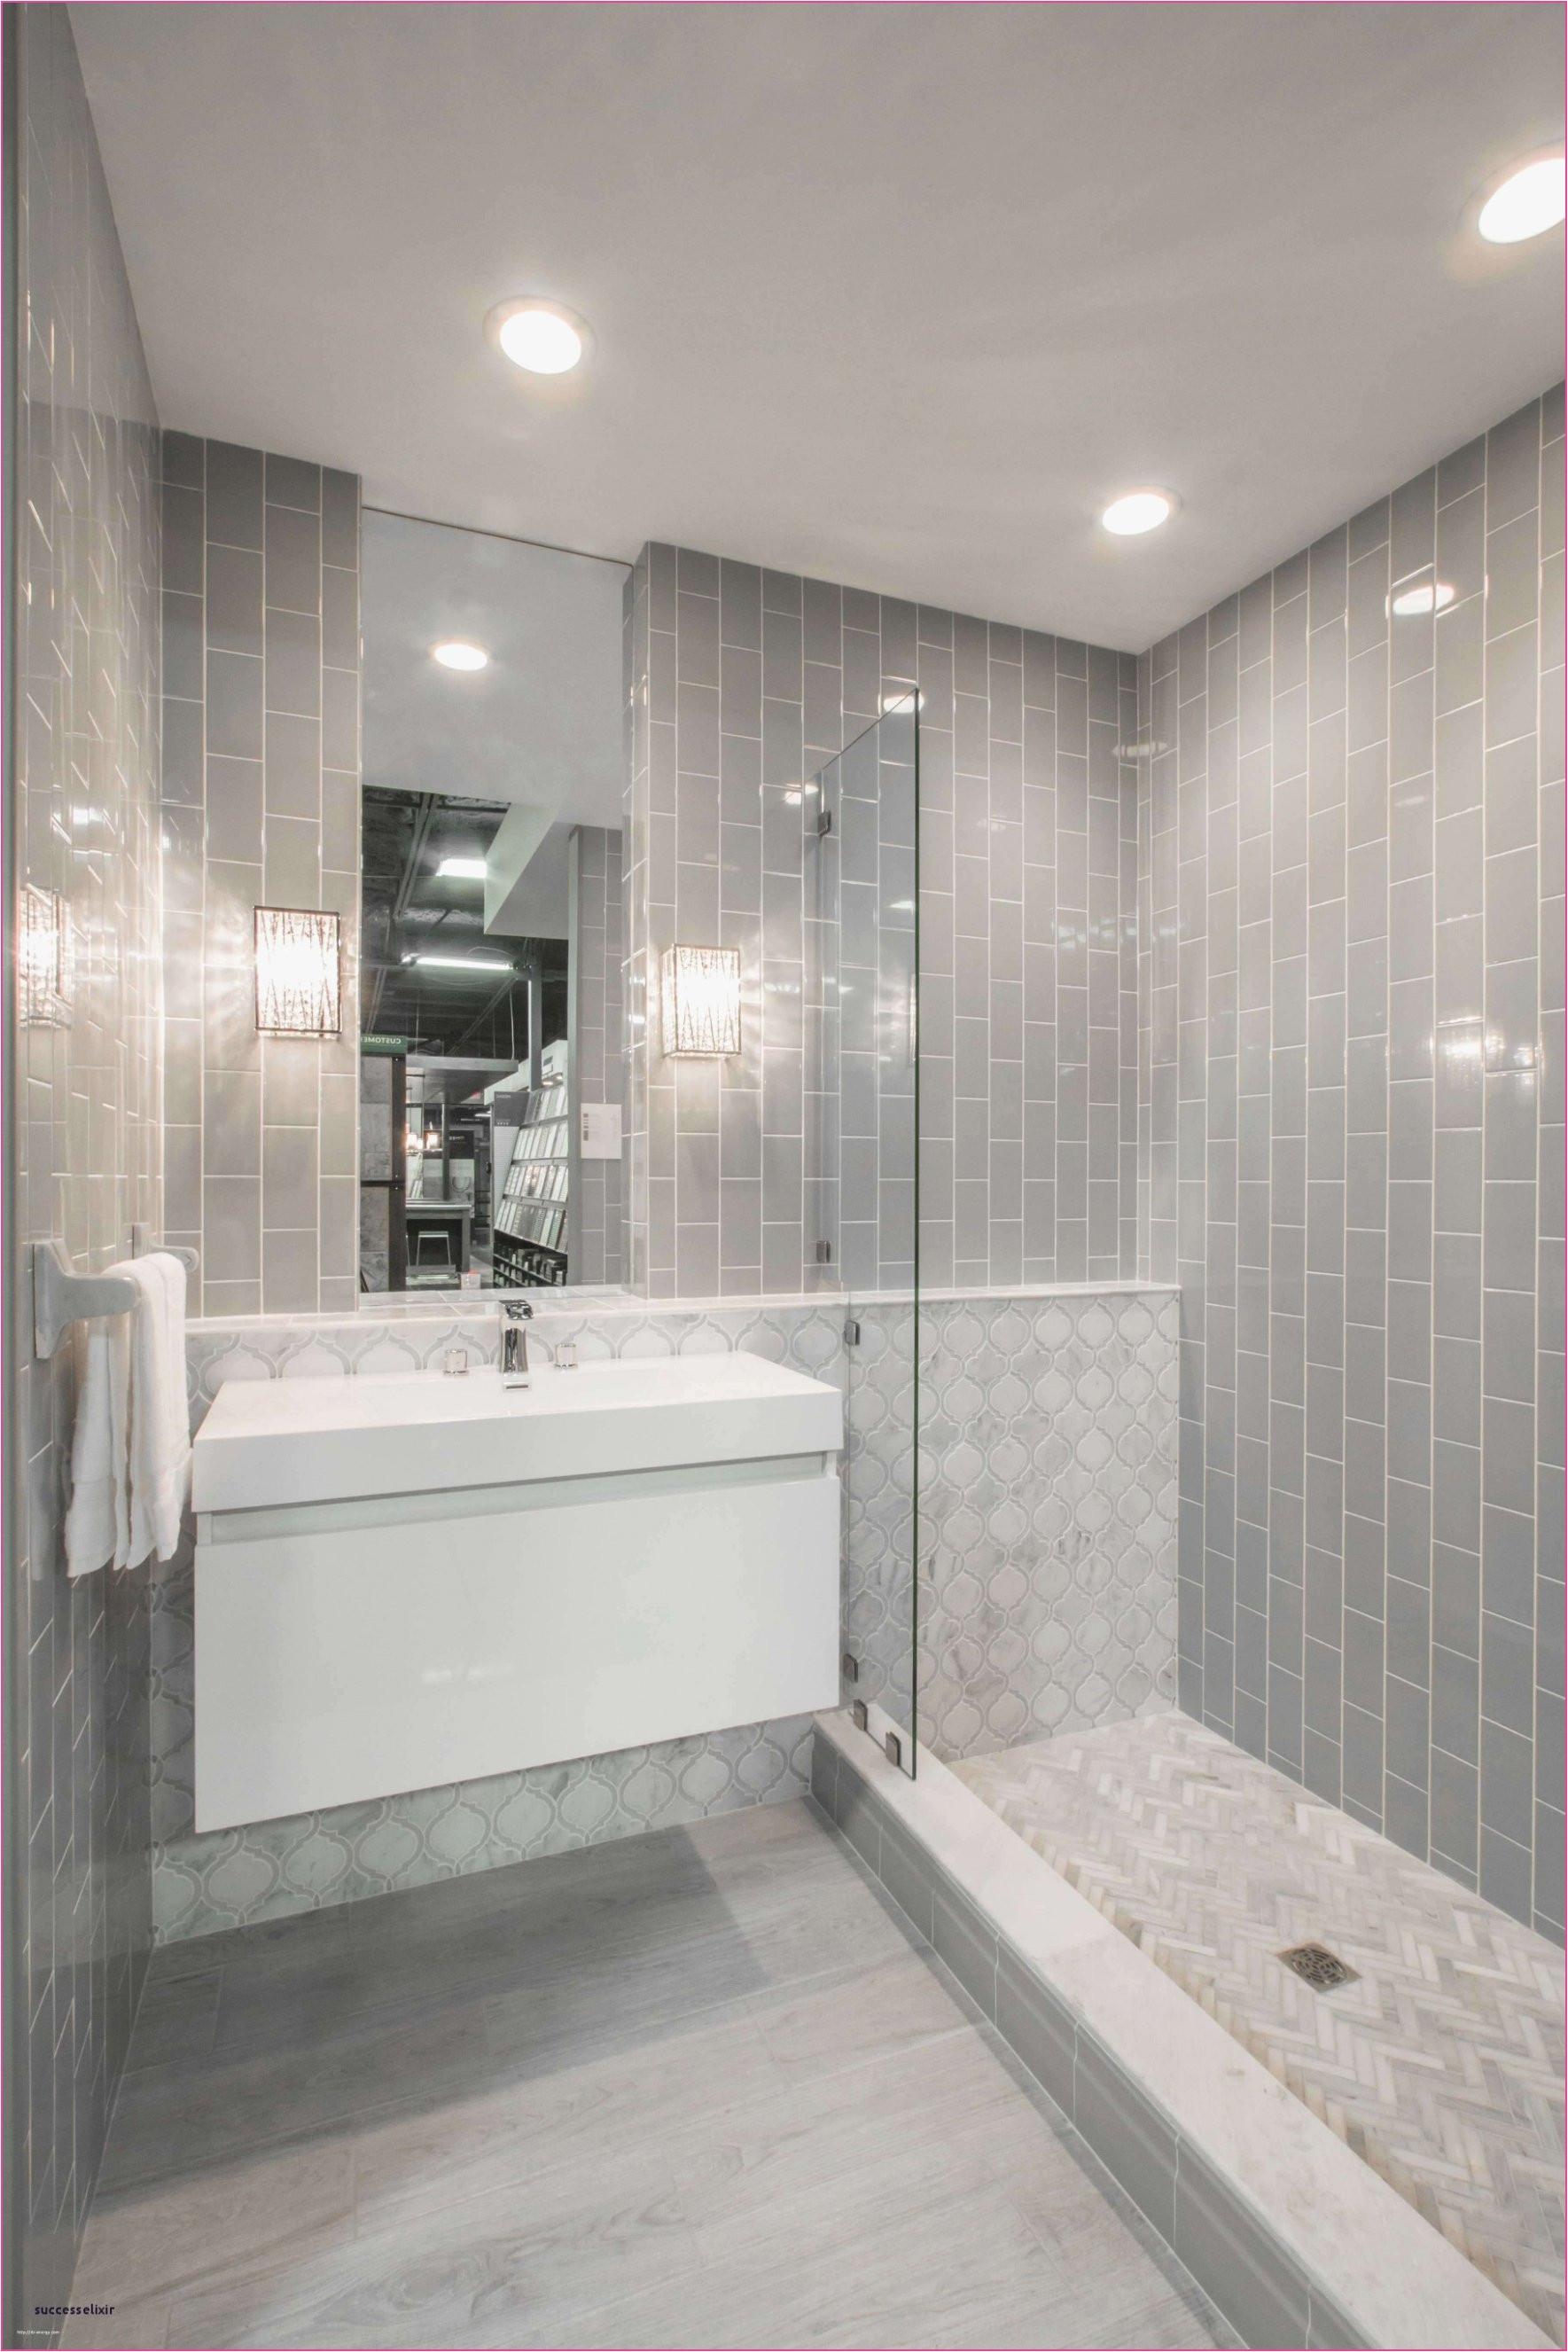 Bathroom Ideas Gallery Inspirational Small Bathroom Ideas Gallery